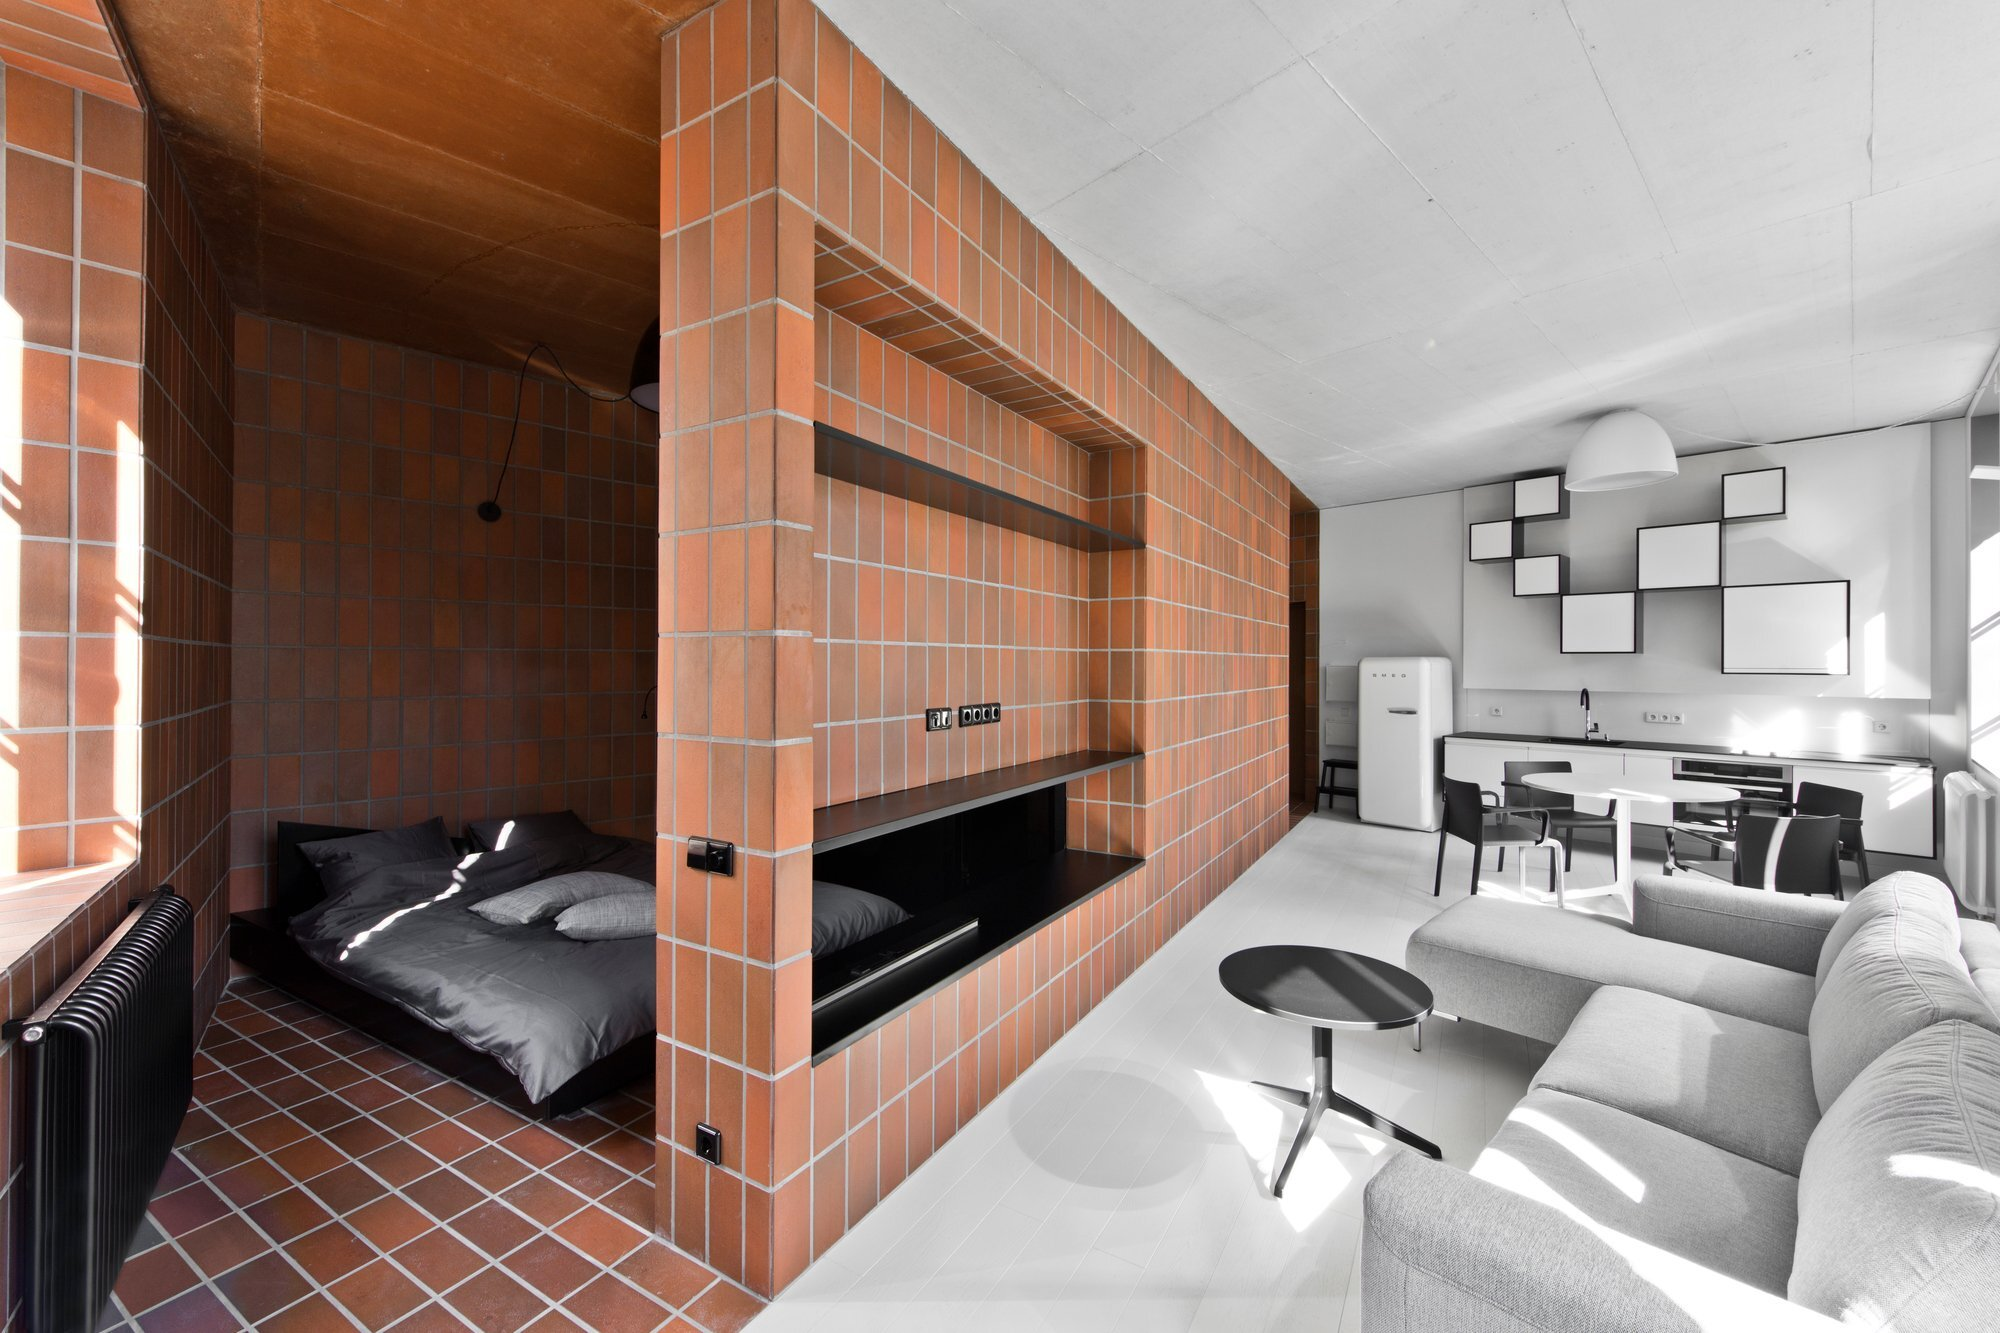 Bazillion - YCL Studio - Lithuania - Bedroom and Living Room - Humble Homes